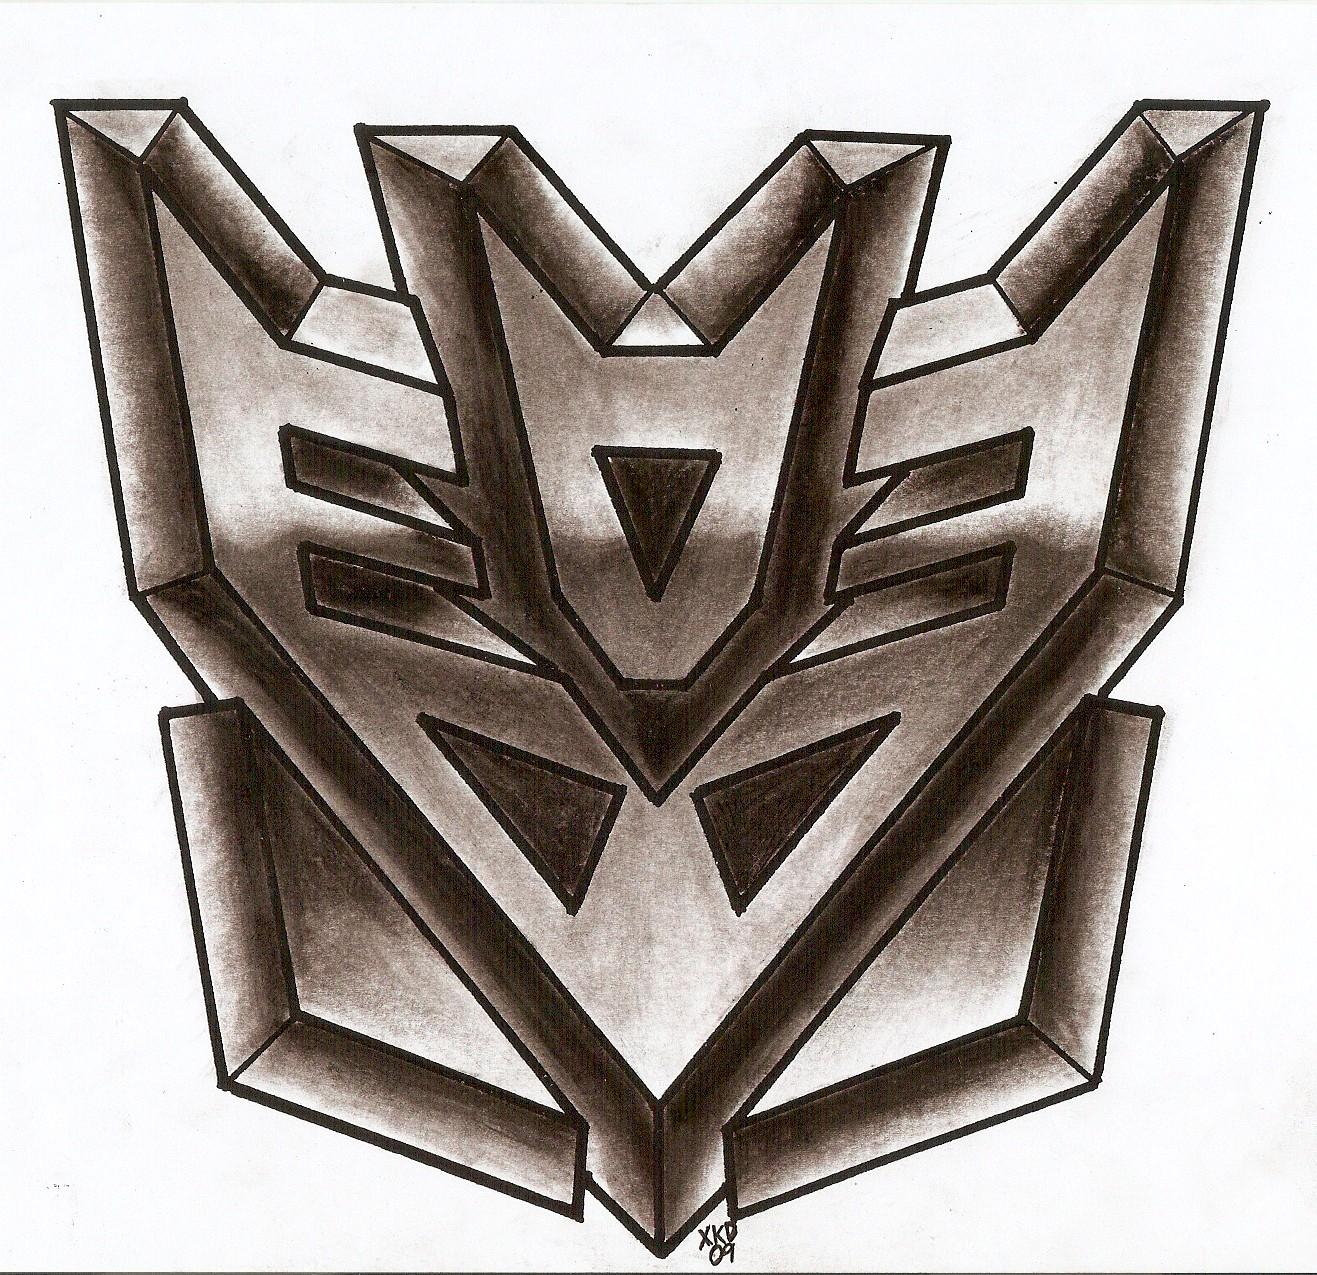 DECEPTICON_logo_by_Xkado.jpg